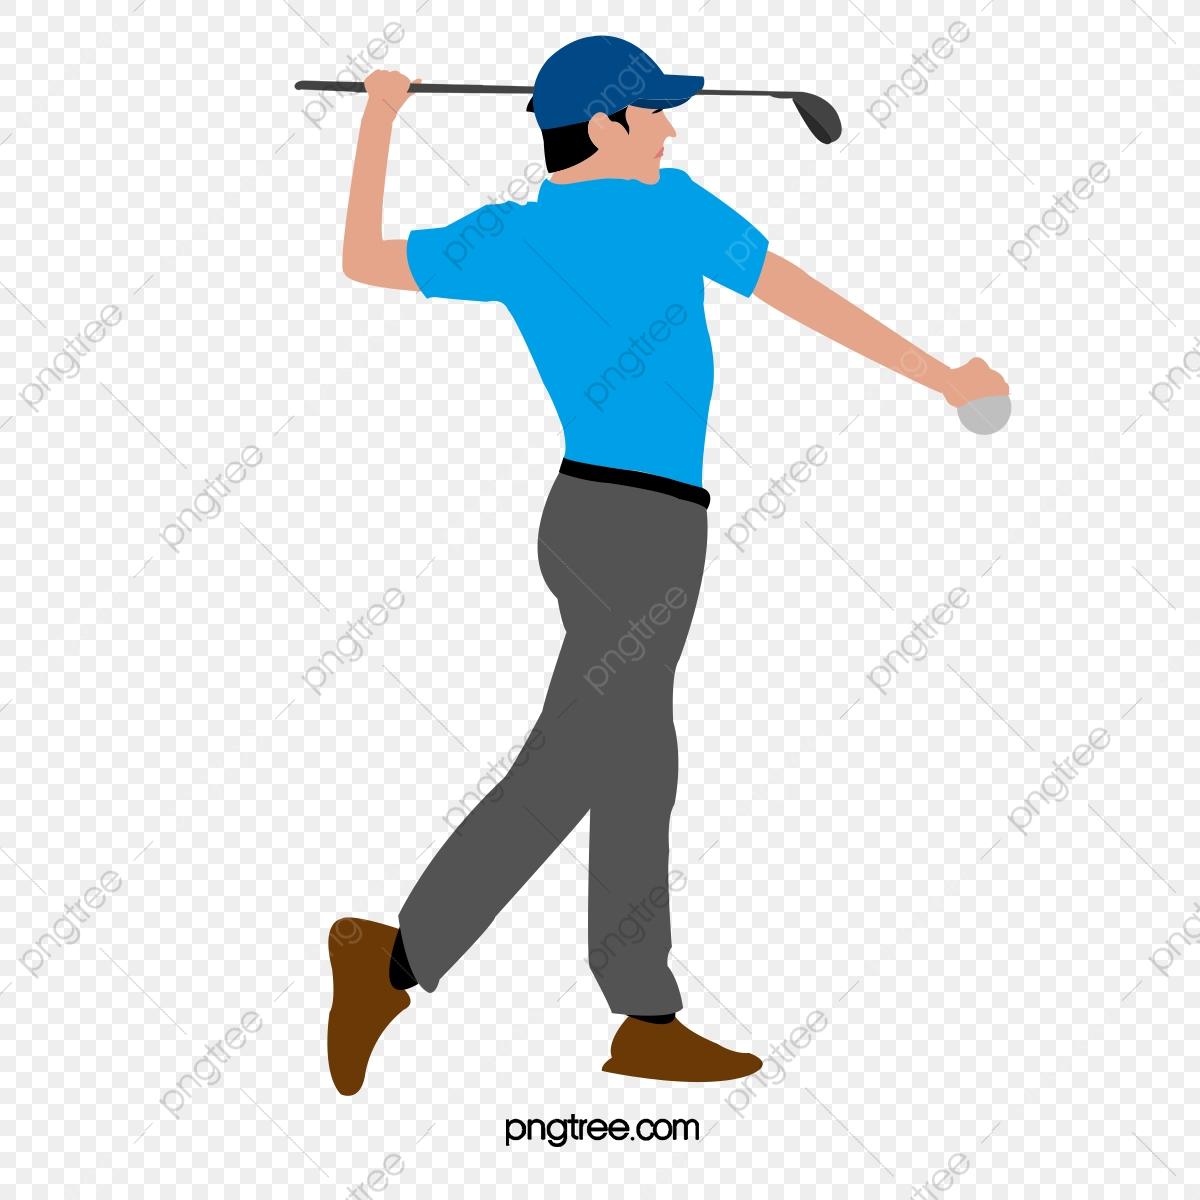 Golfer clipart men's. Mens golf movement png